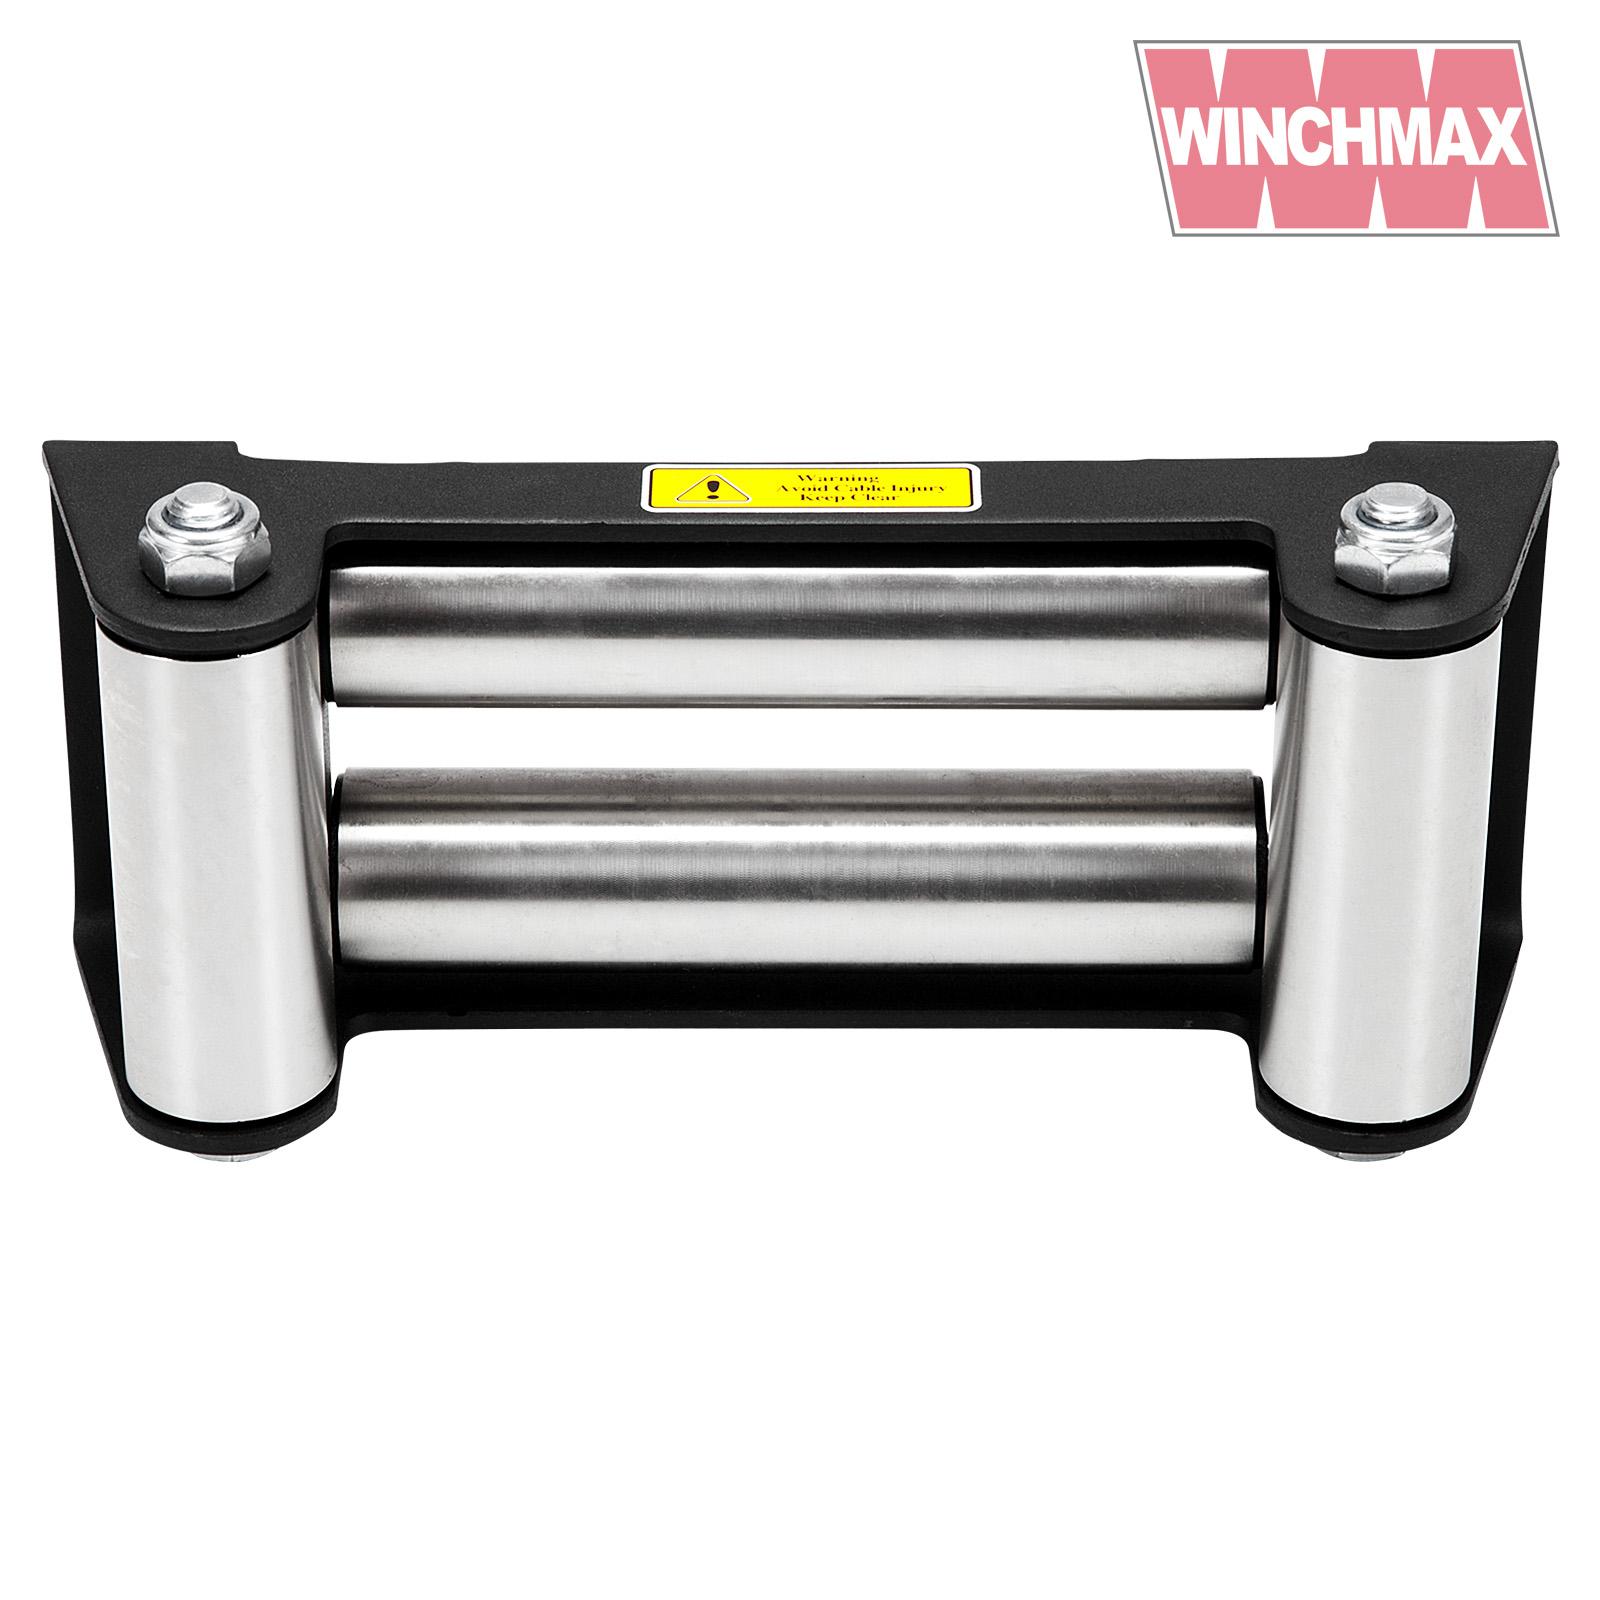 Wmrfmilspec winchmax 573